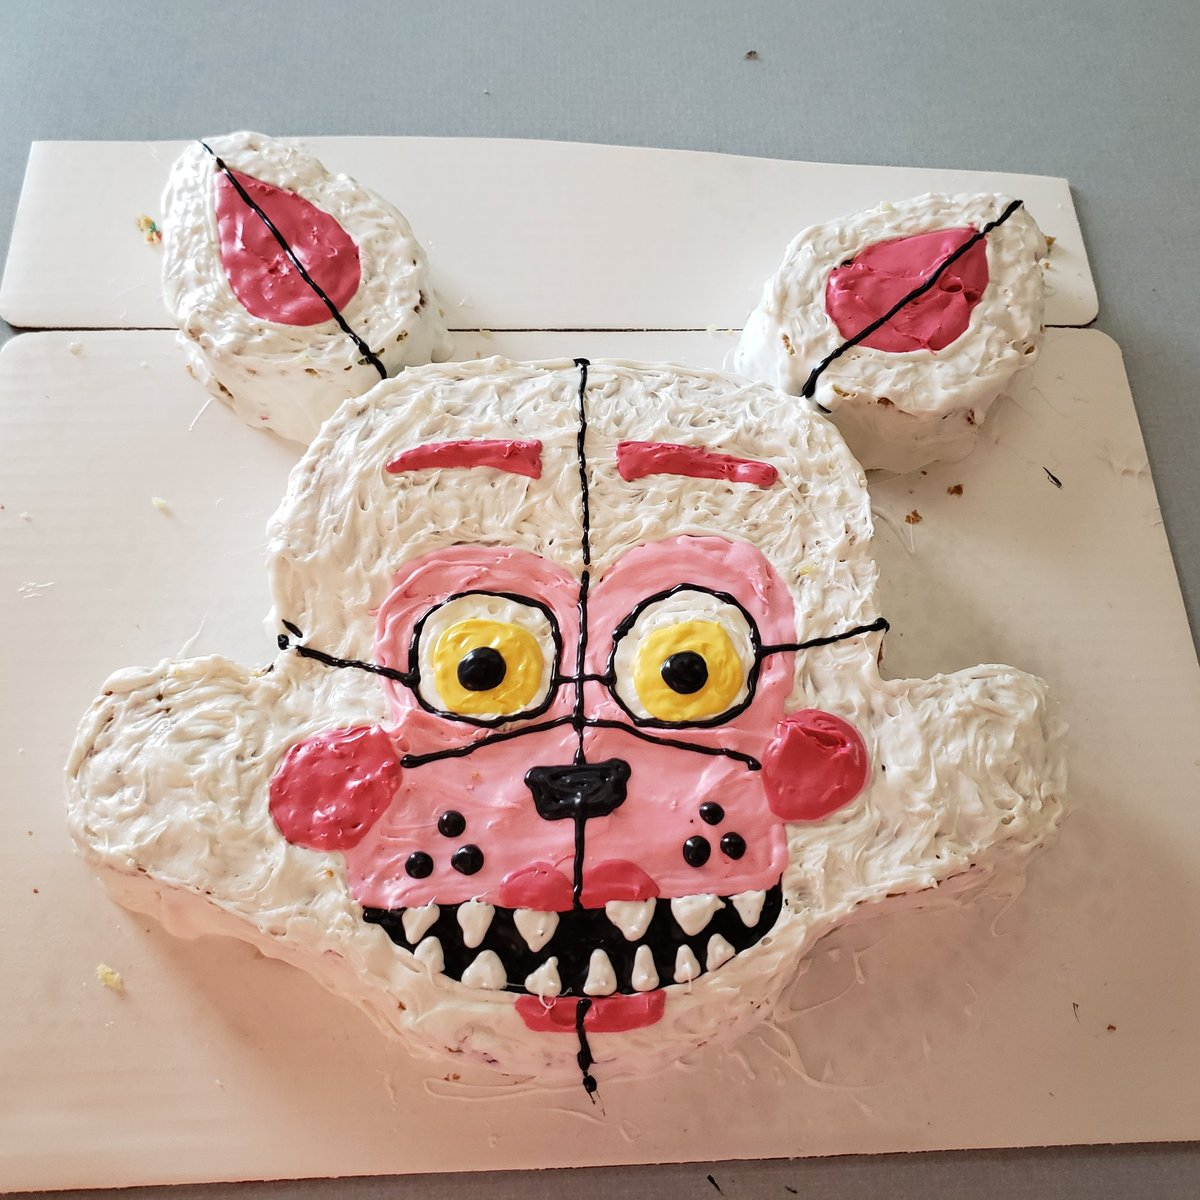 Amanda De Shano On Twitter Funtime Foxy Birthday Cake I Made For